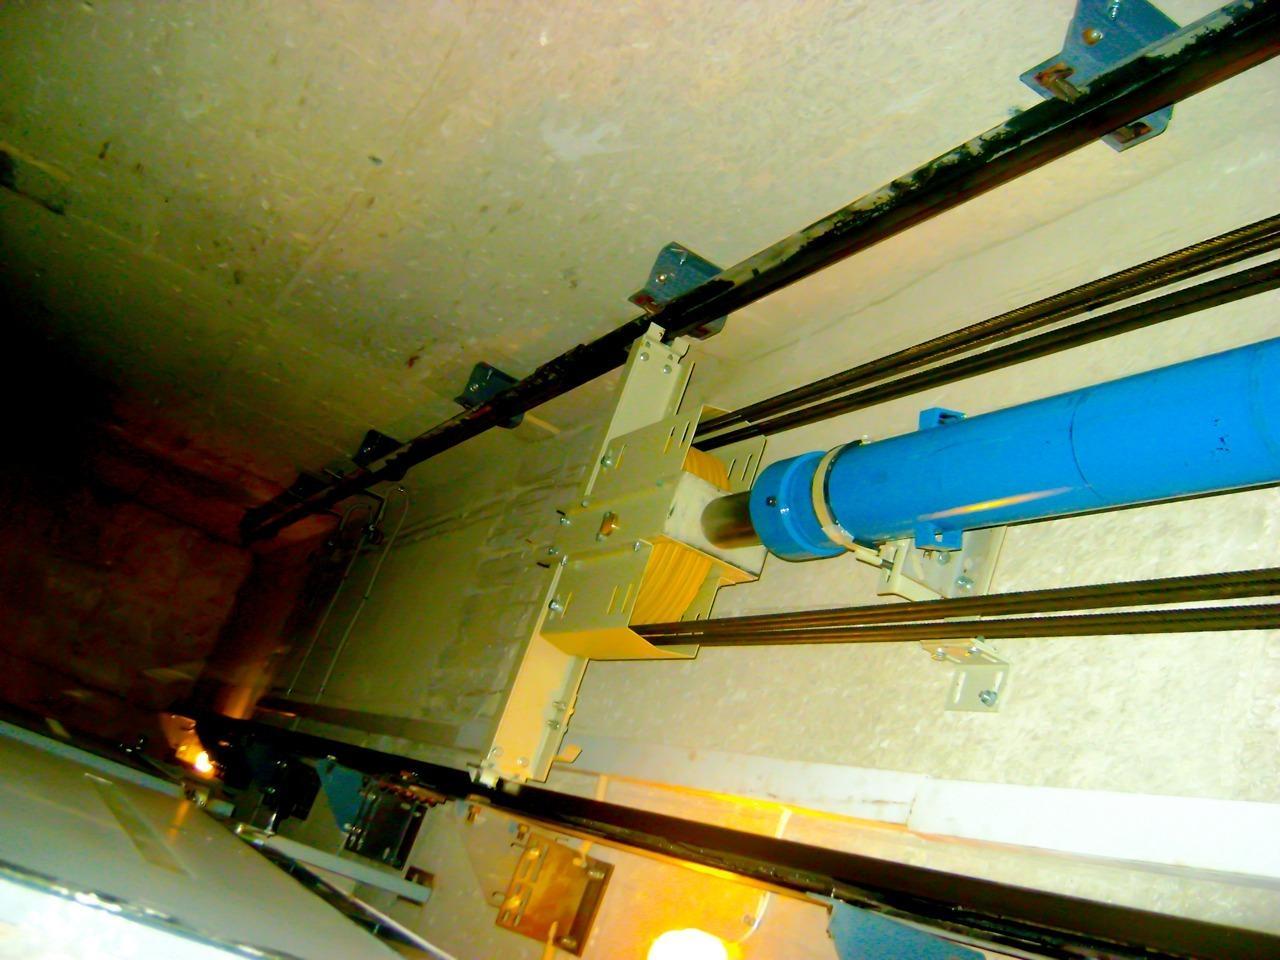 zlift-erga-lifts-14 Εγκατάσταση Ανελκυστήρα - Ρόδος